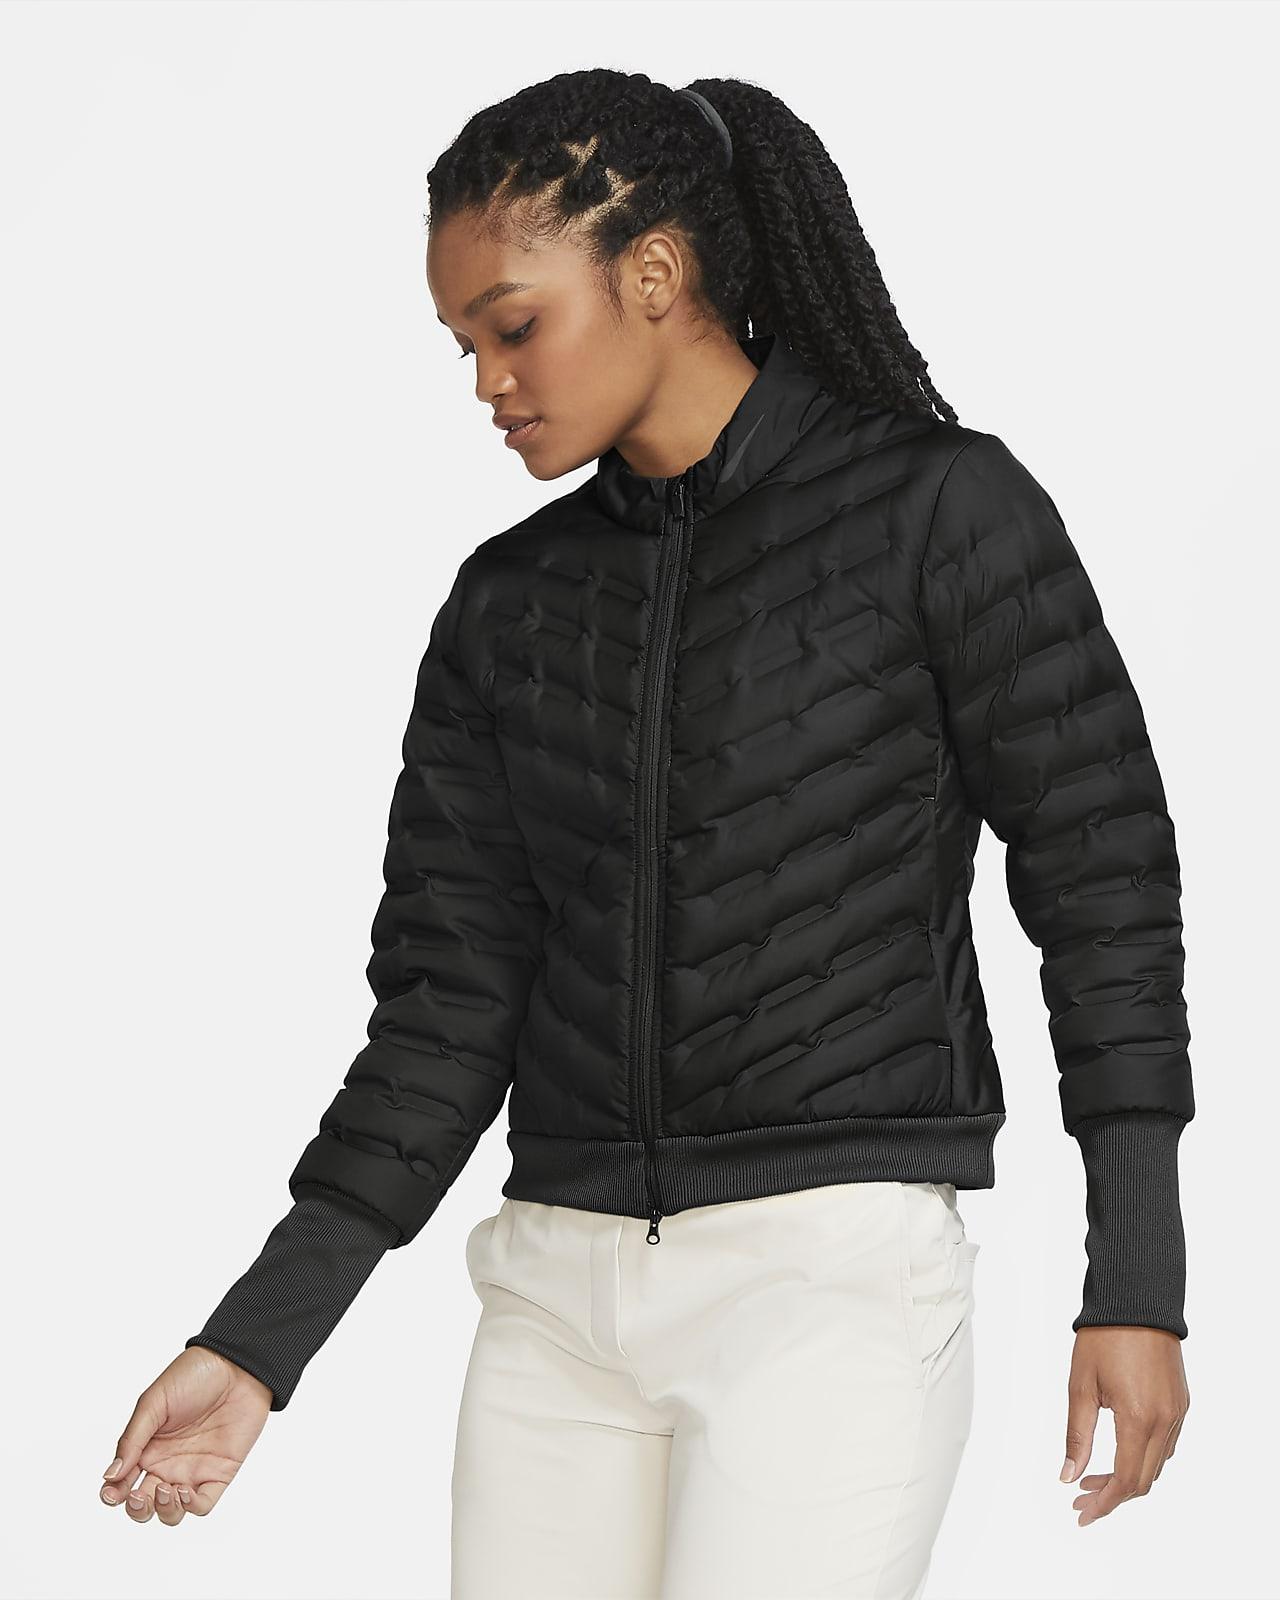 Nike AeroLoft Repel Women's Full-Zip Golf Jacket